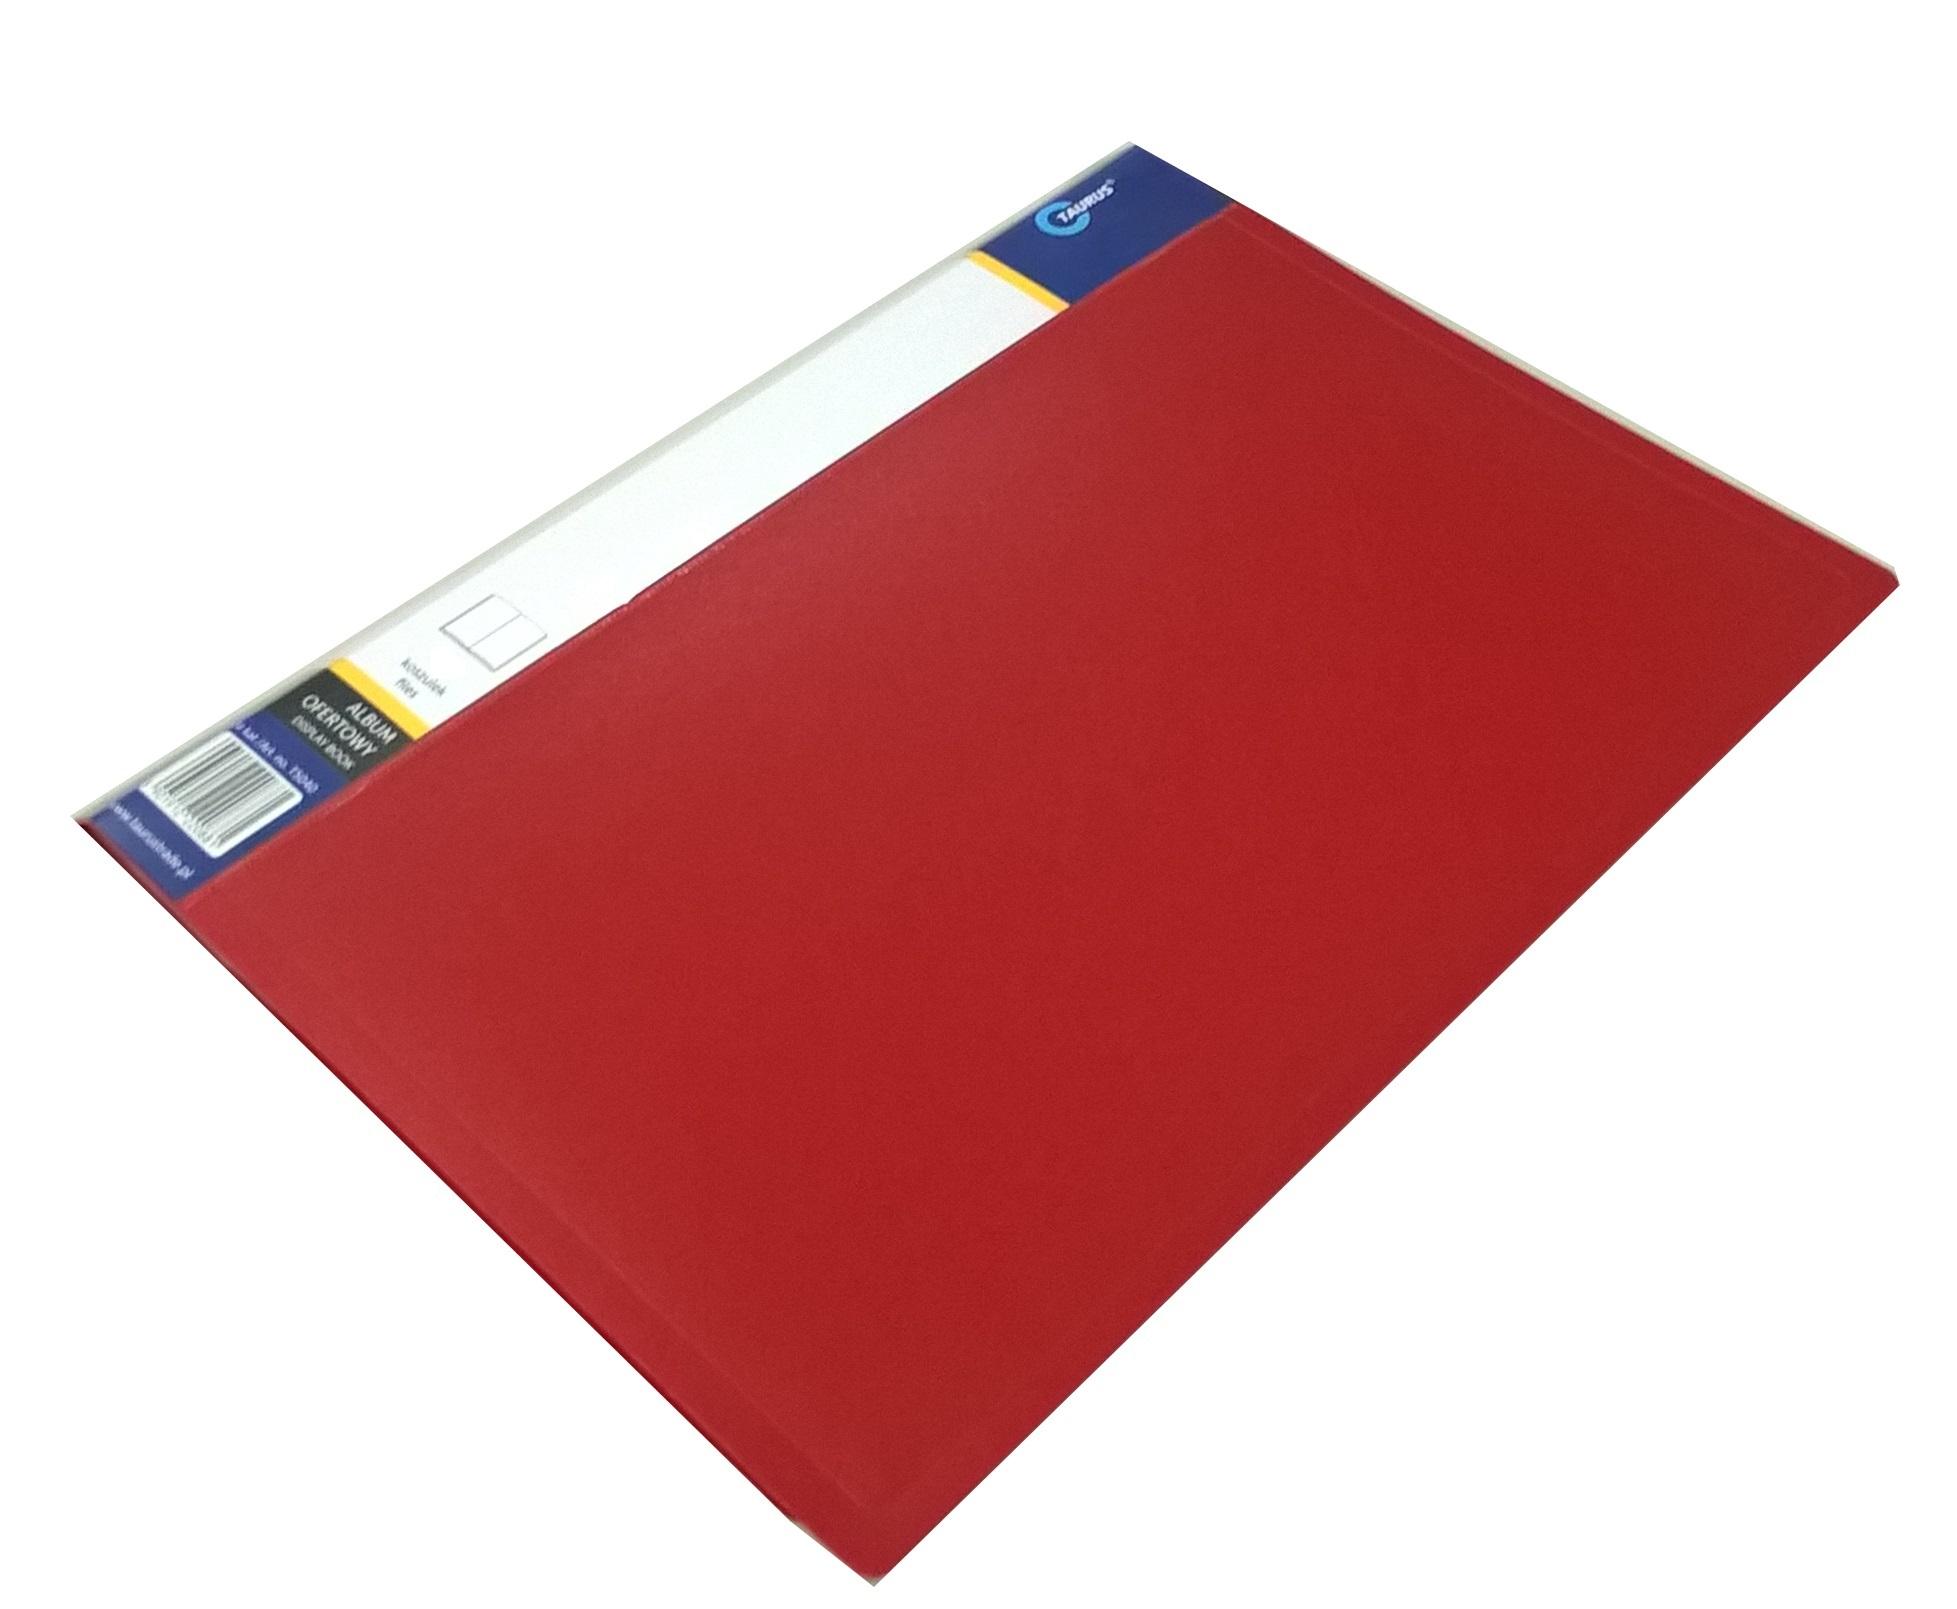 Item FOLDER OFFER ALBUM A4 10 sheets-RED cover